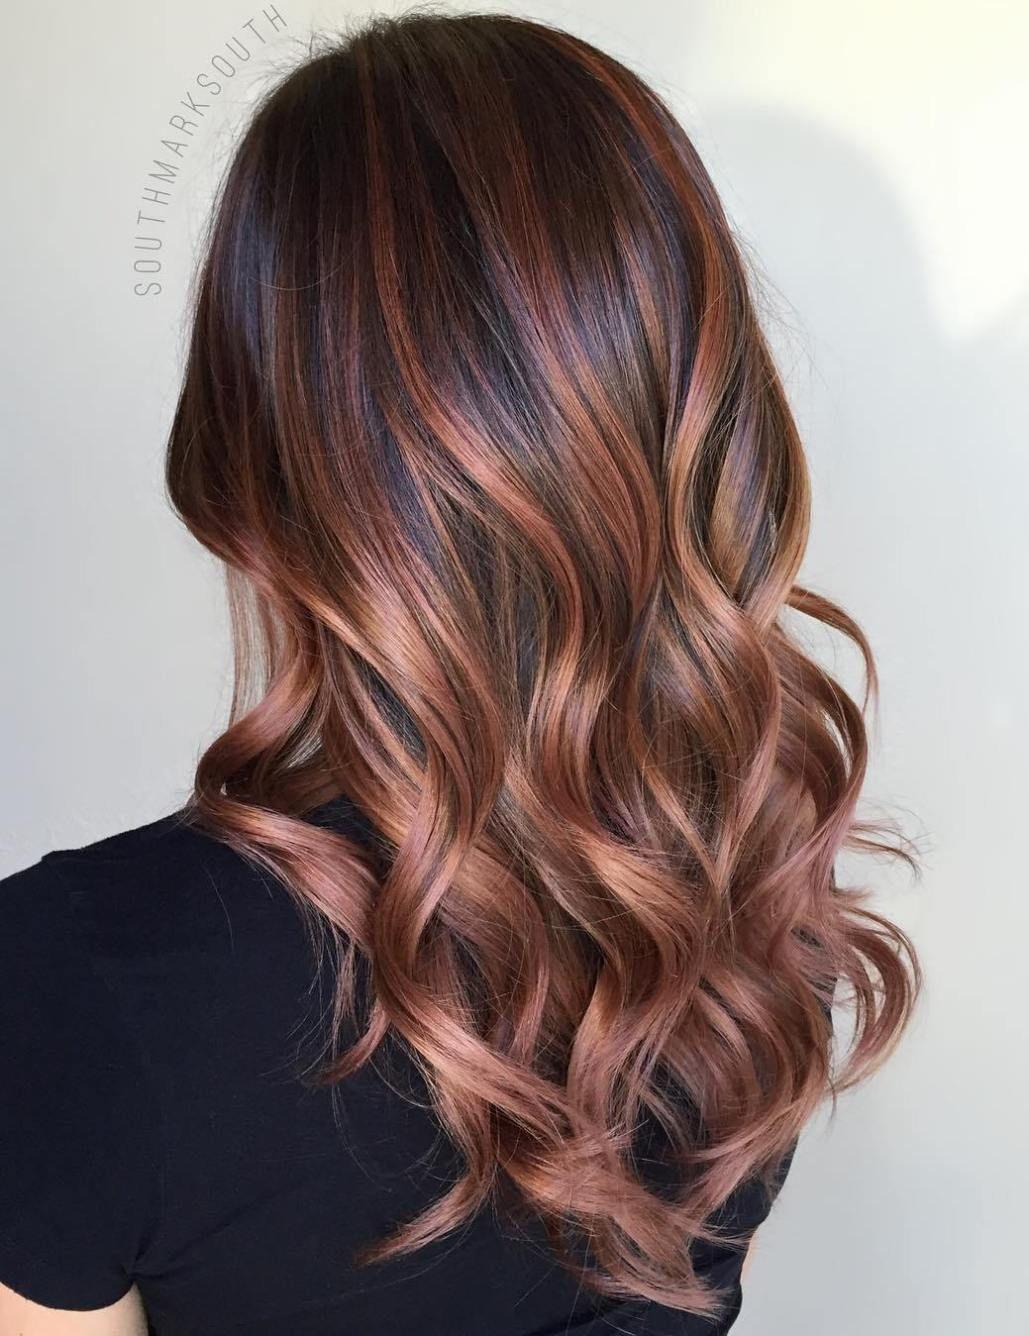 Dark Brown Hair With Caramel Balayage Hair Color Rose